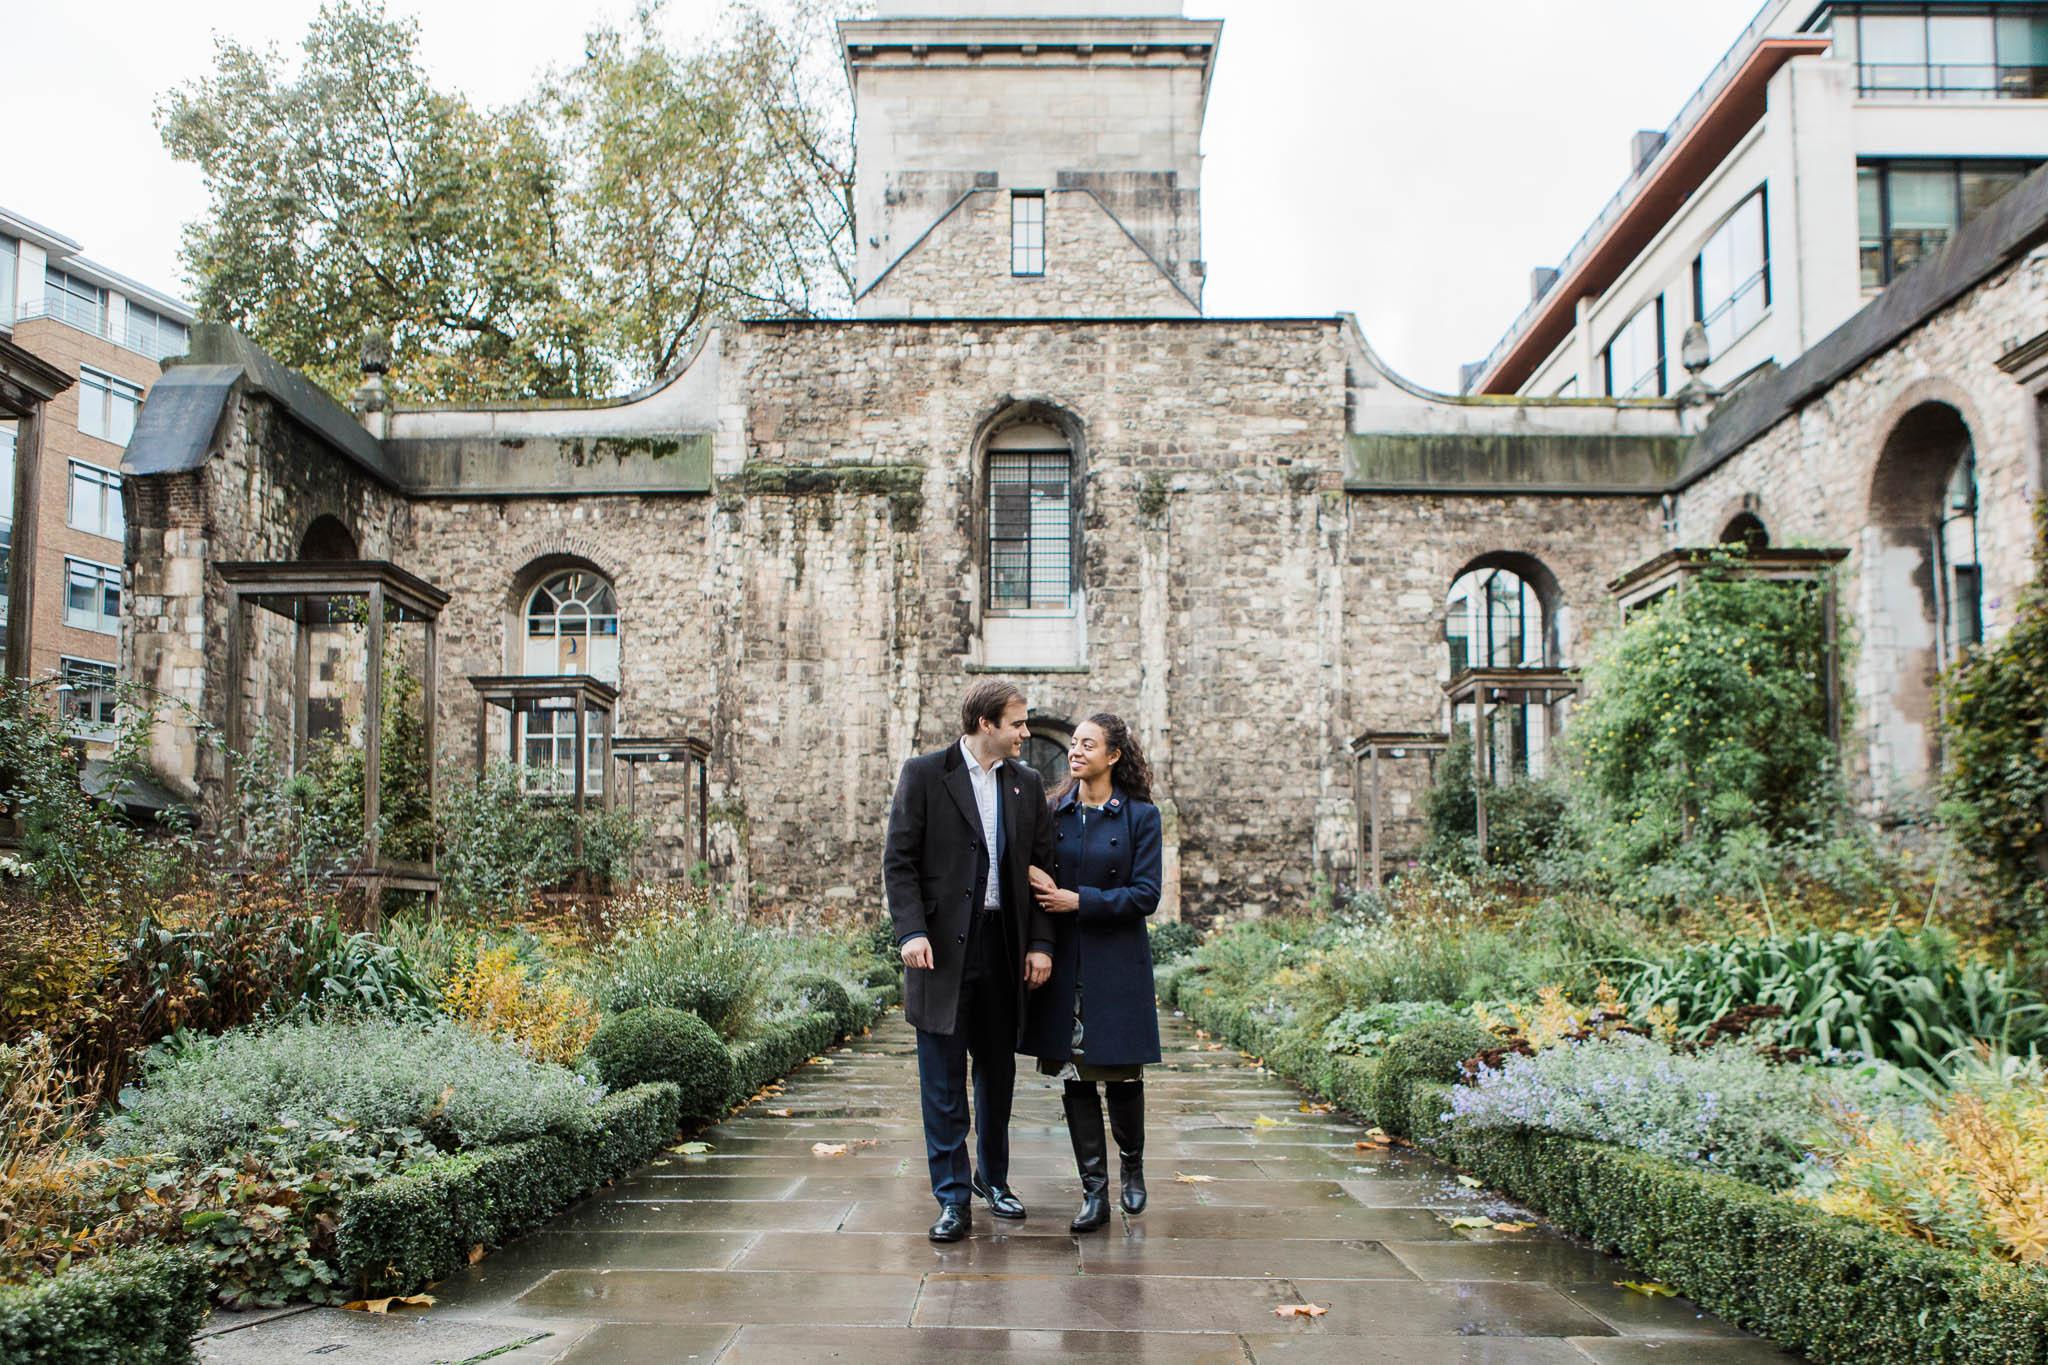 Photo shoot in london gardens